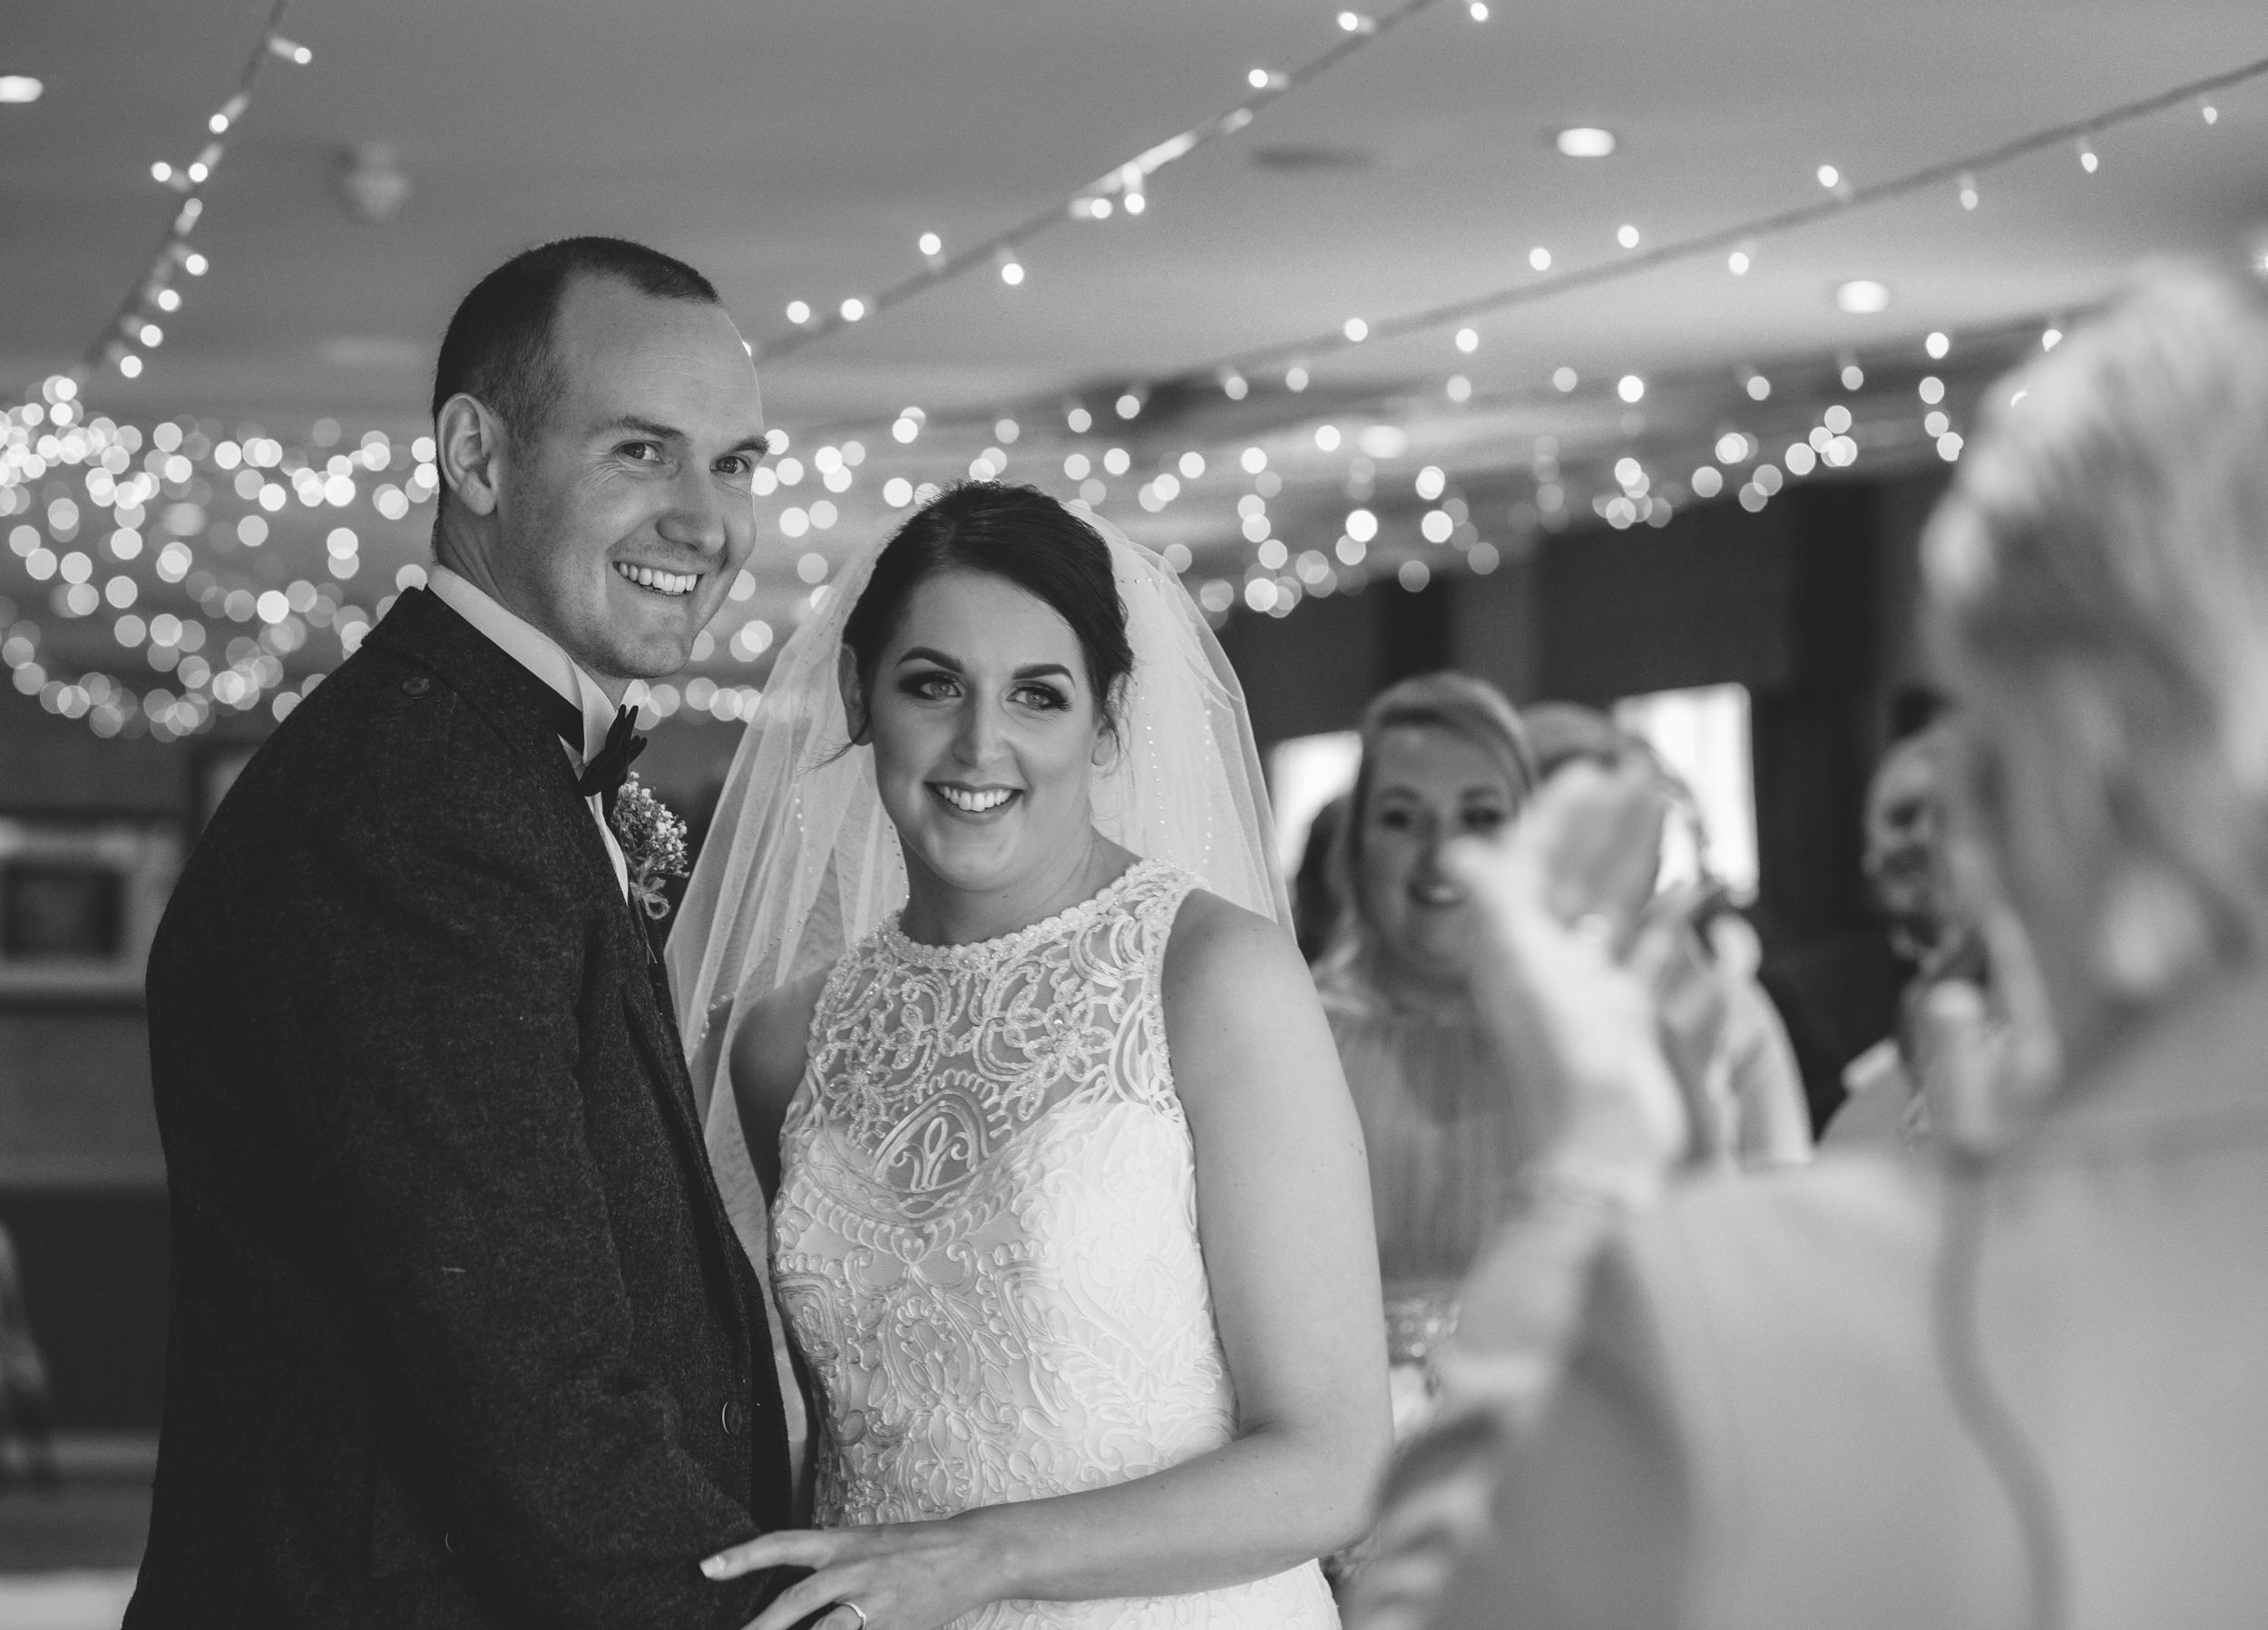 Banchory lodge wedding, wedding at Banchory lodge, wedding photography aberdeen, aberdeen wedding photography